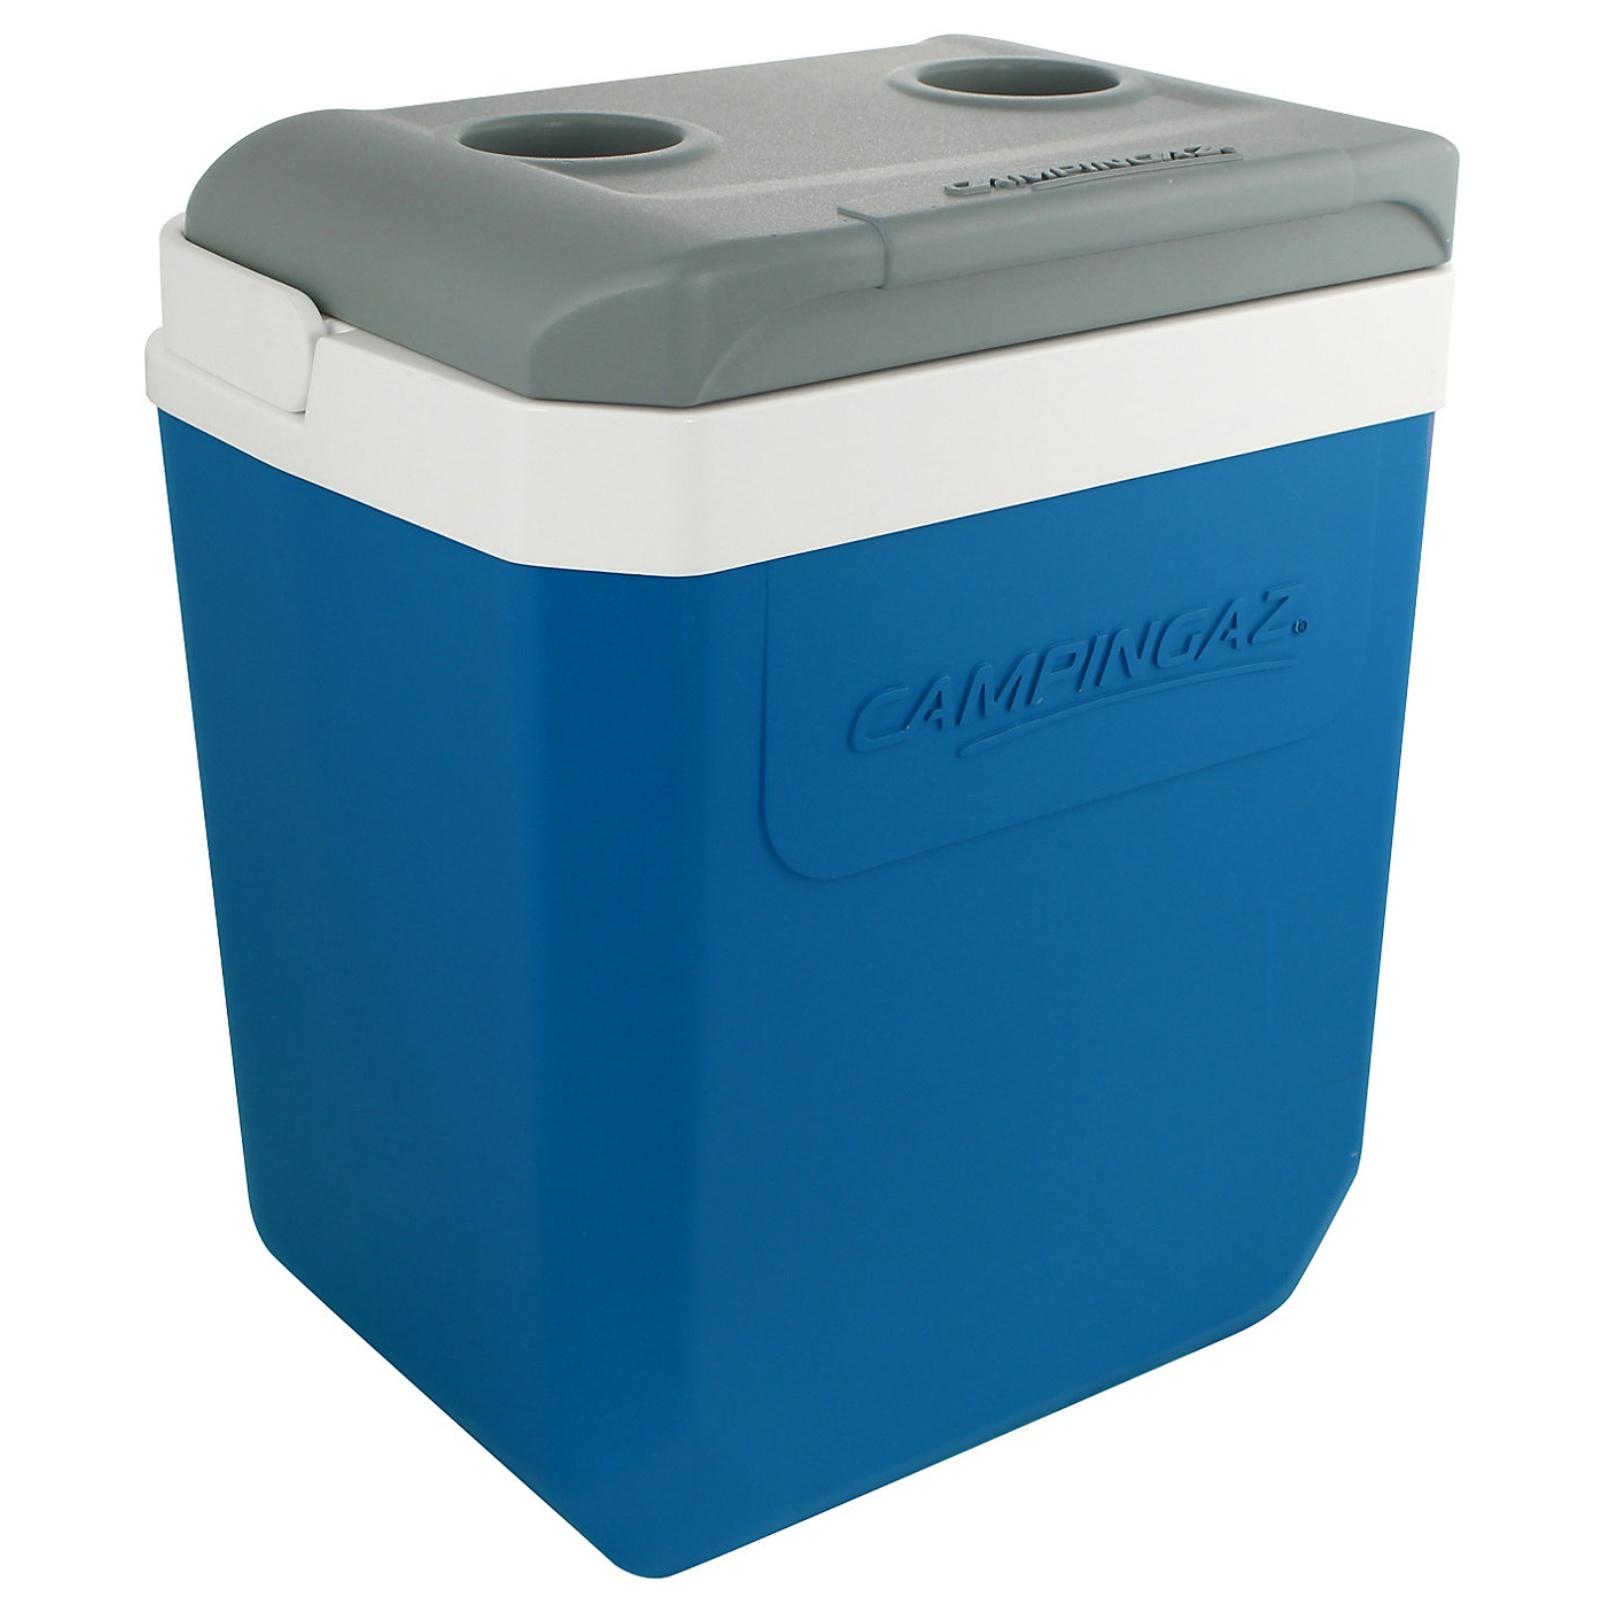 Chladící box CAMPINGAZ Plus Extreme 25l